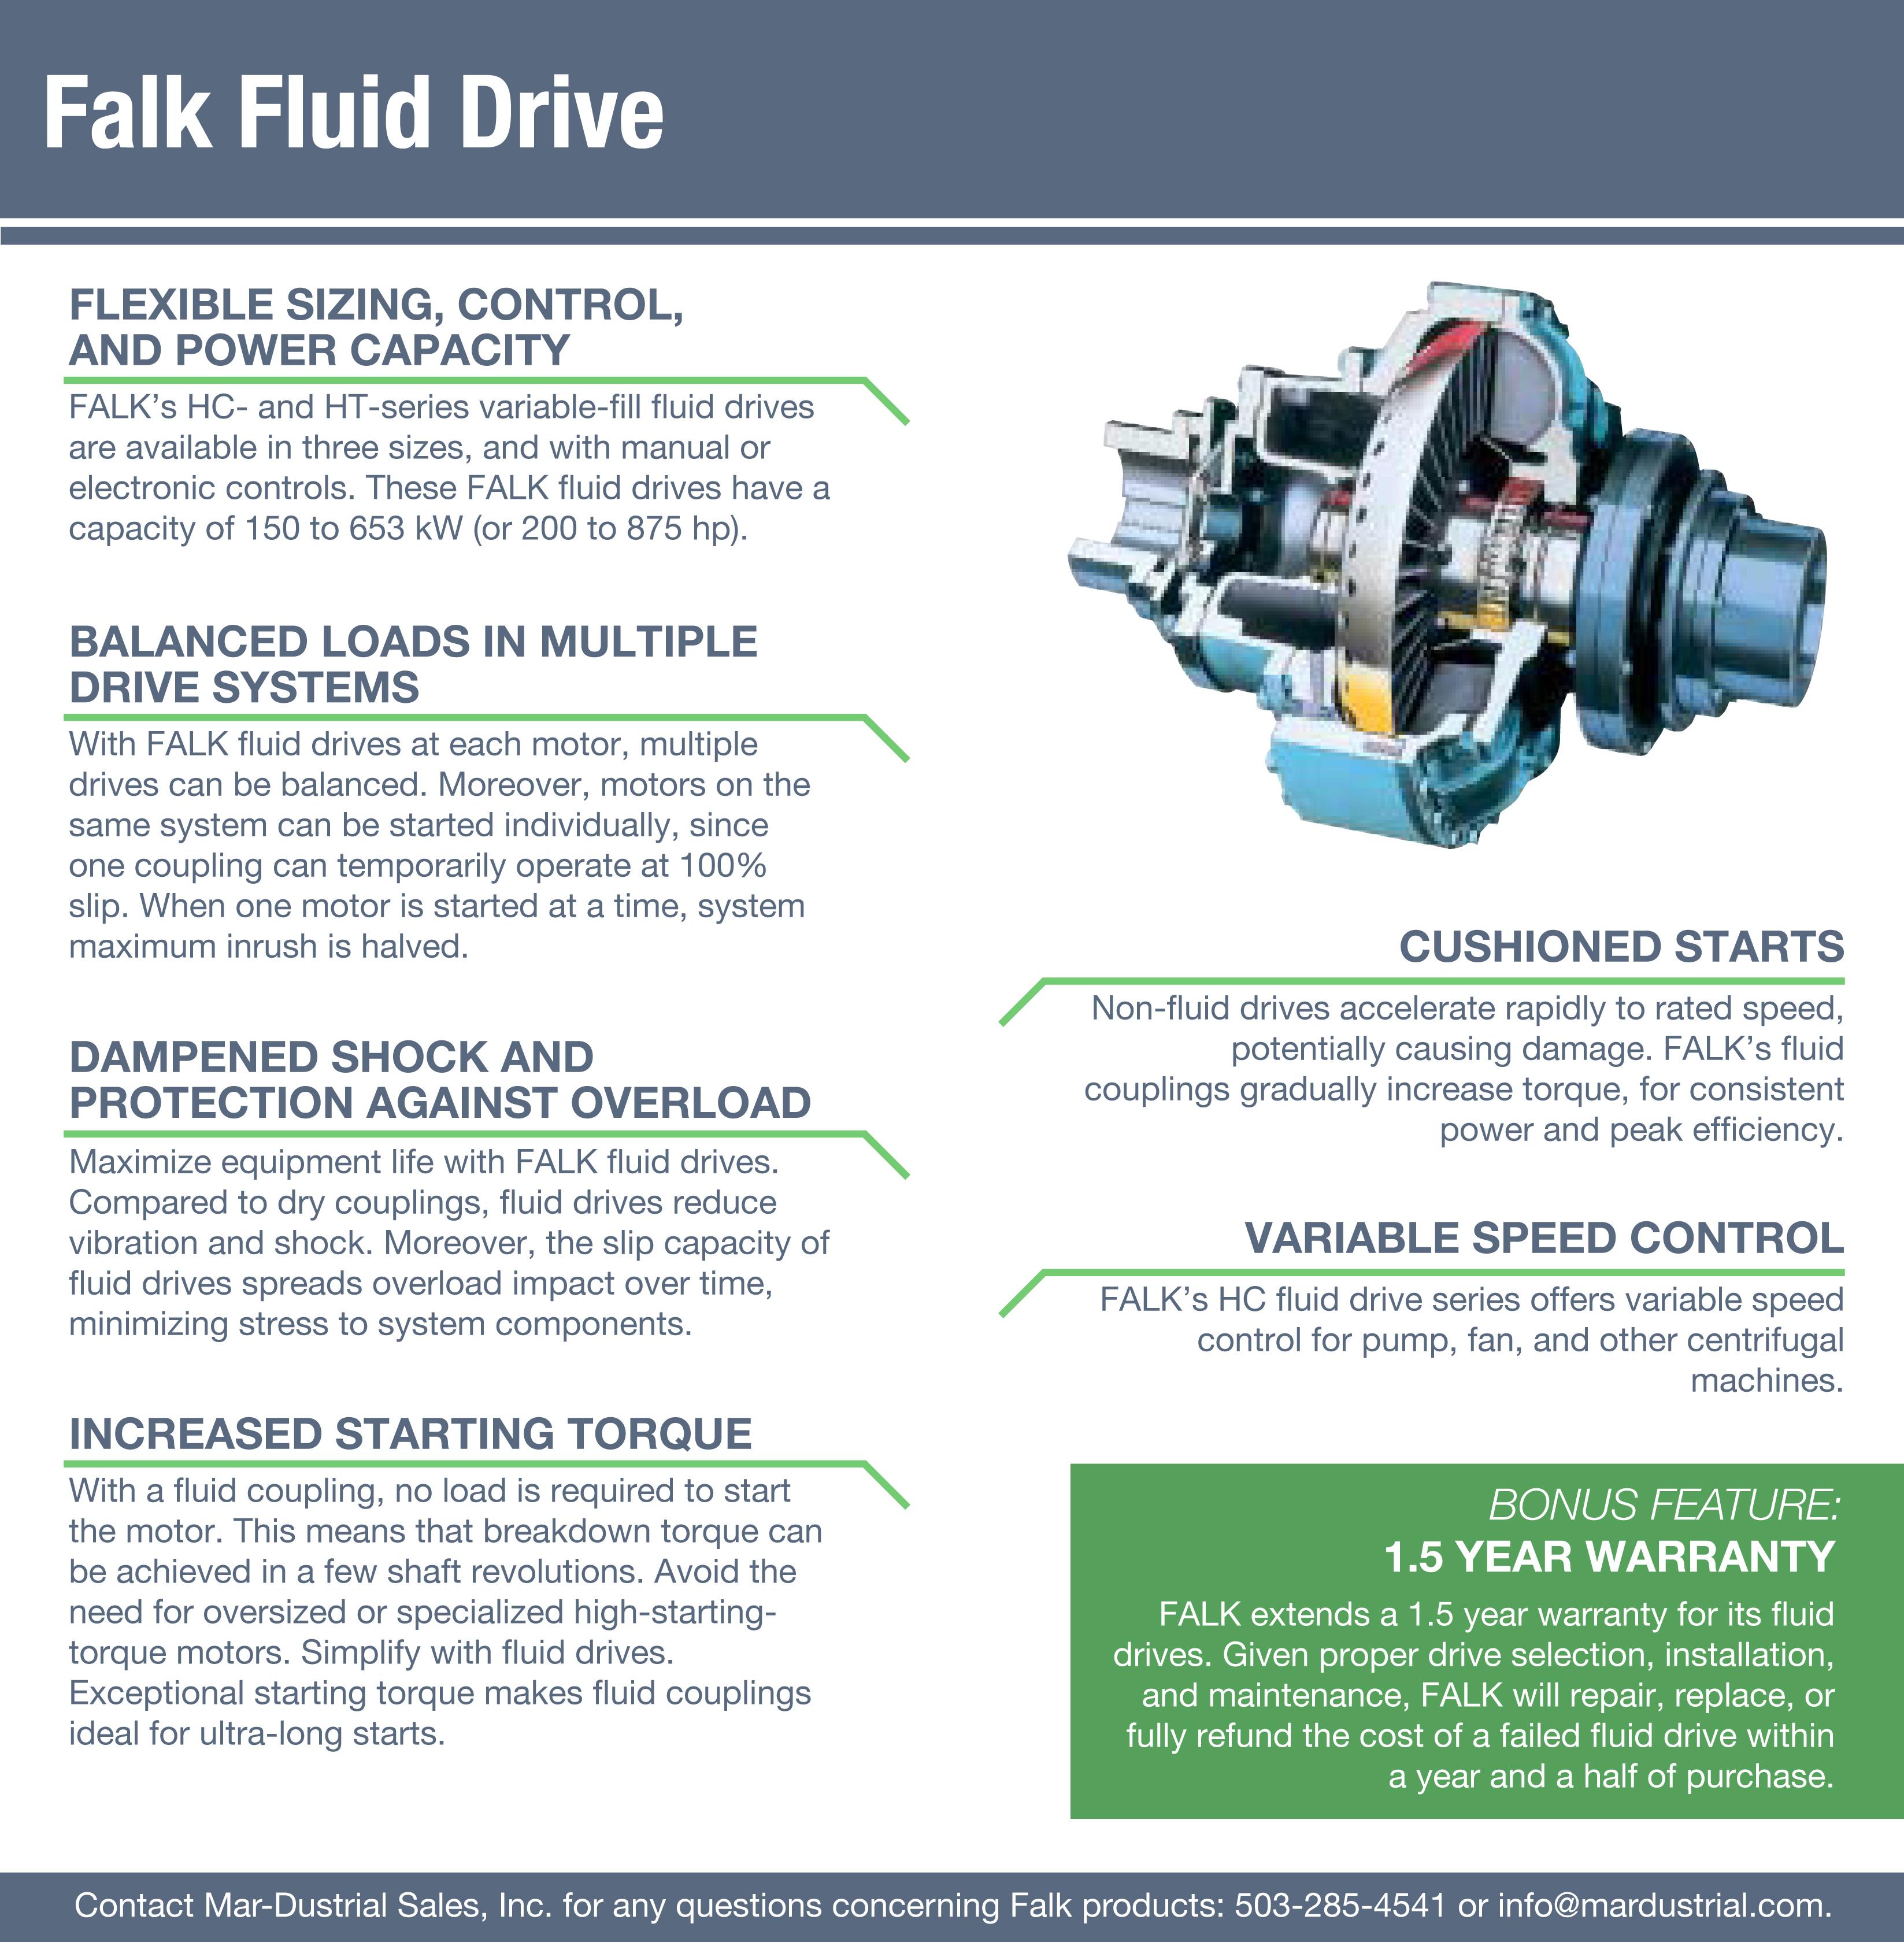 falk fluid drives